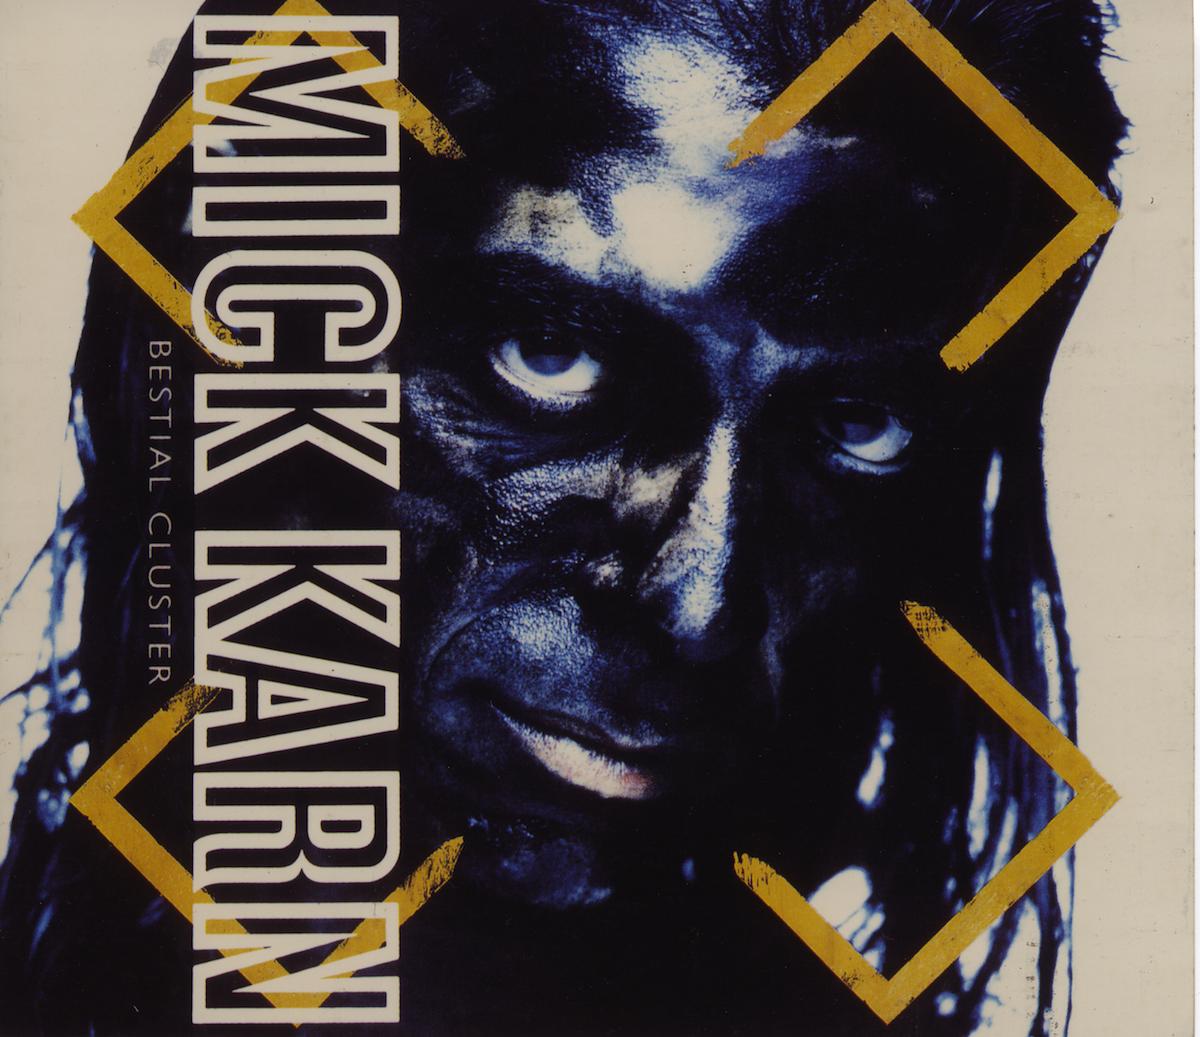 Mick Karn album cover photography by Simon Fuller